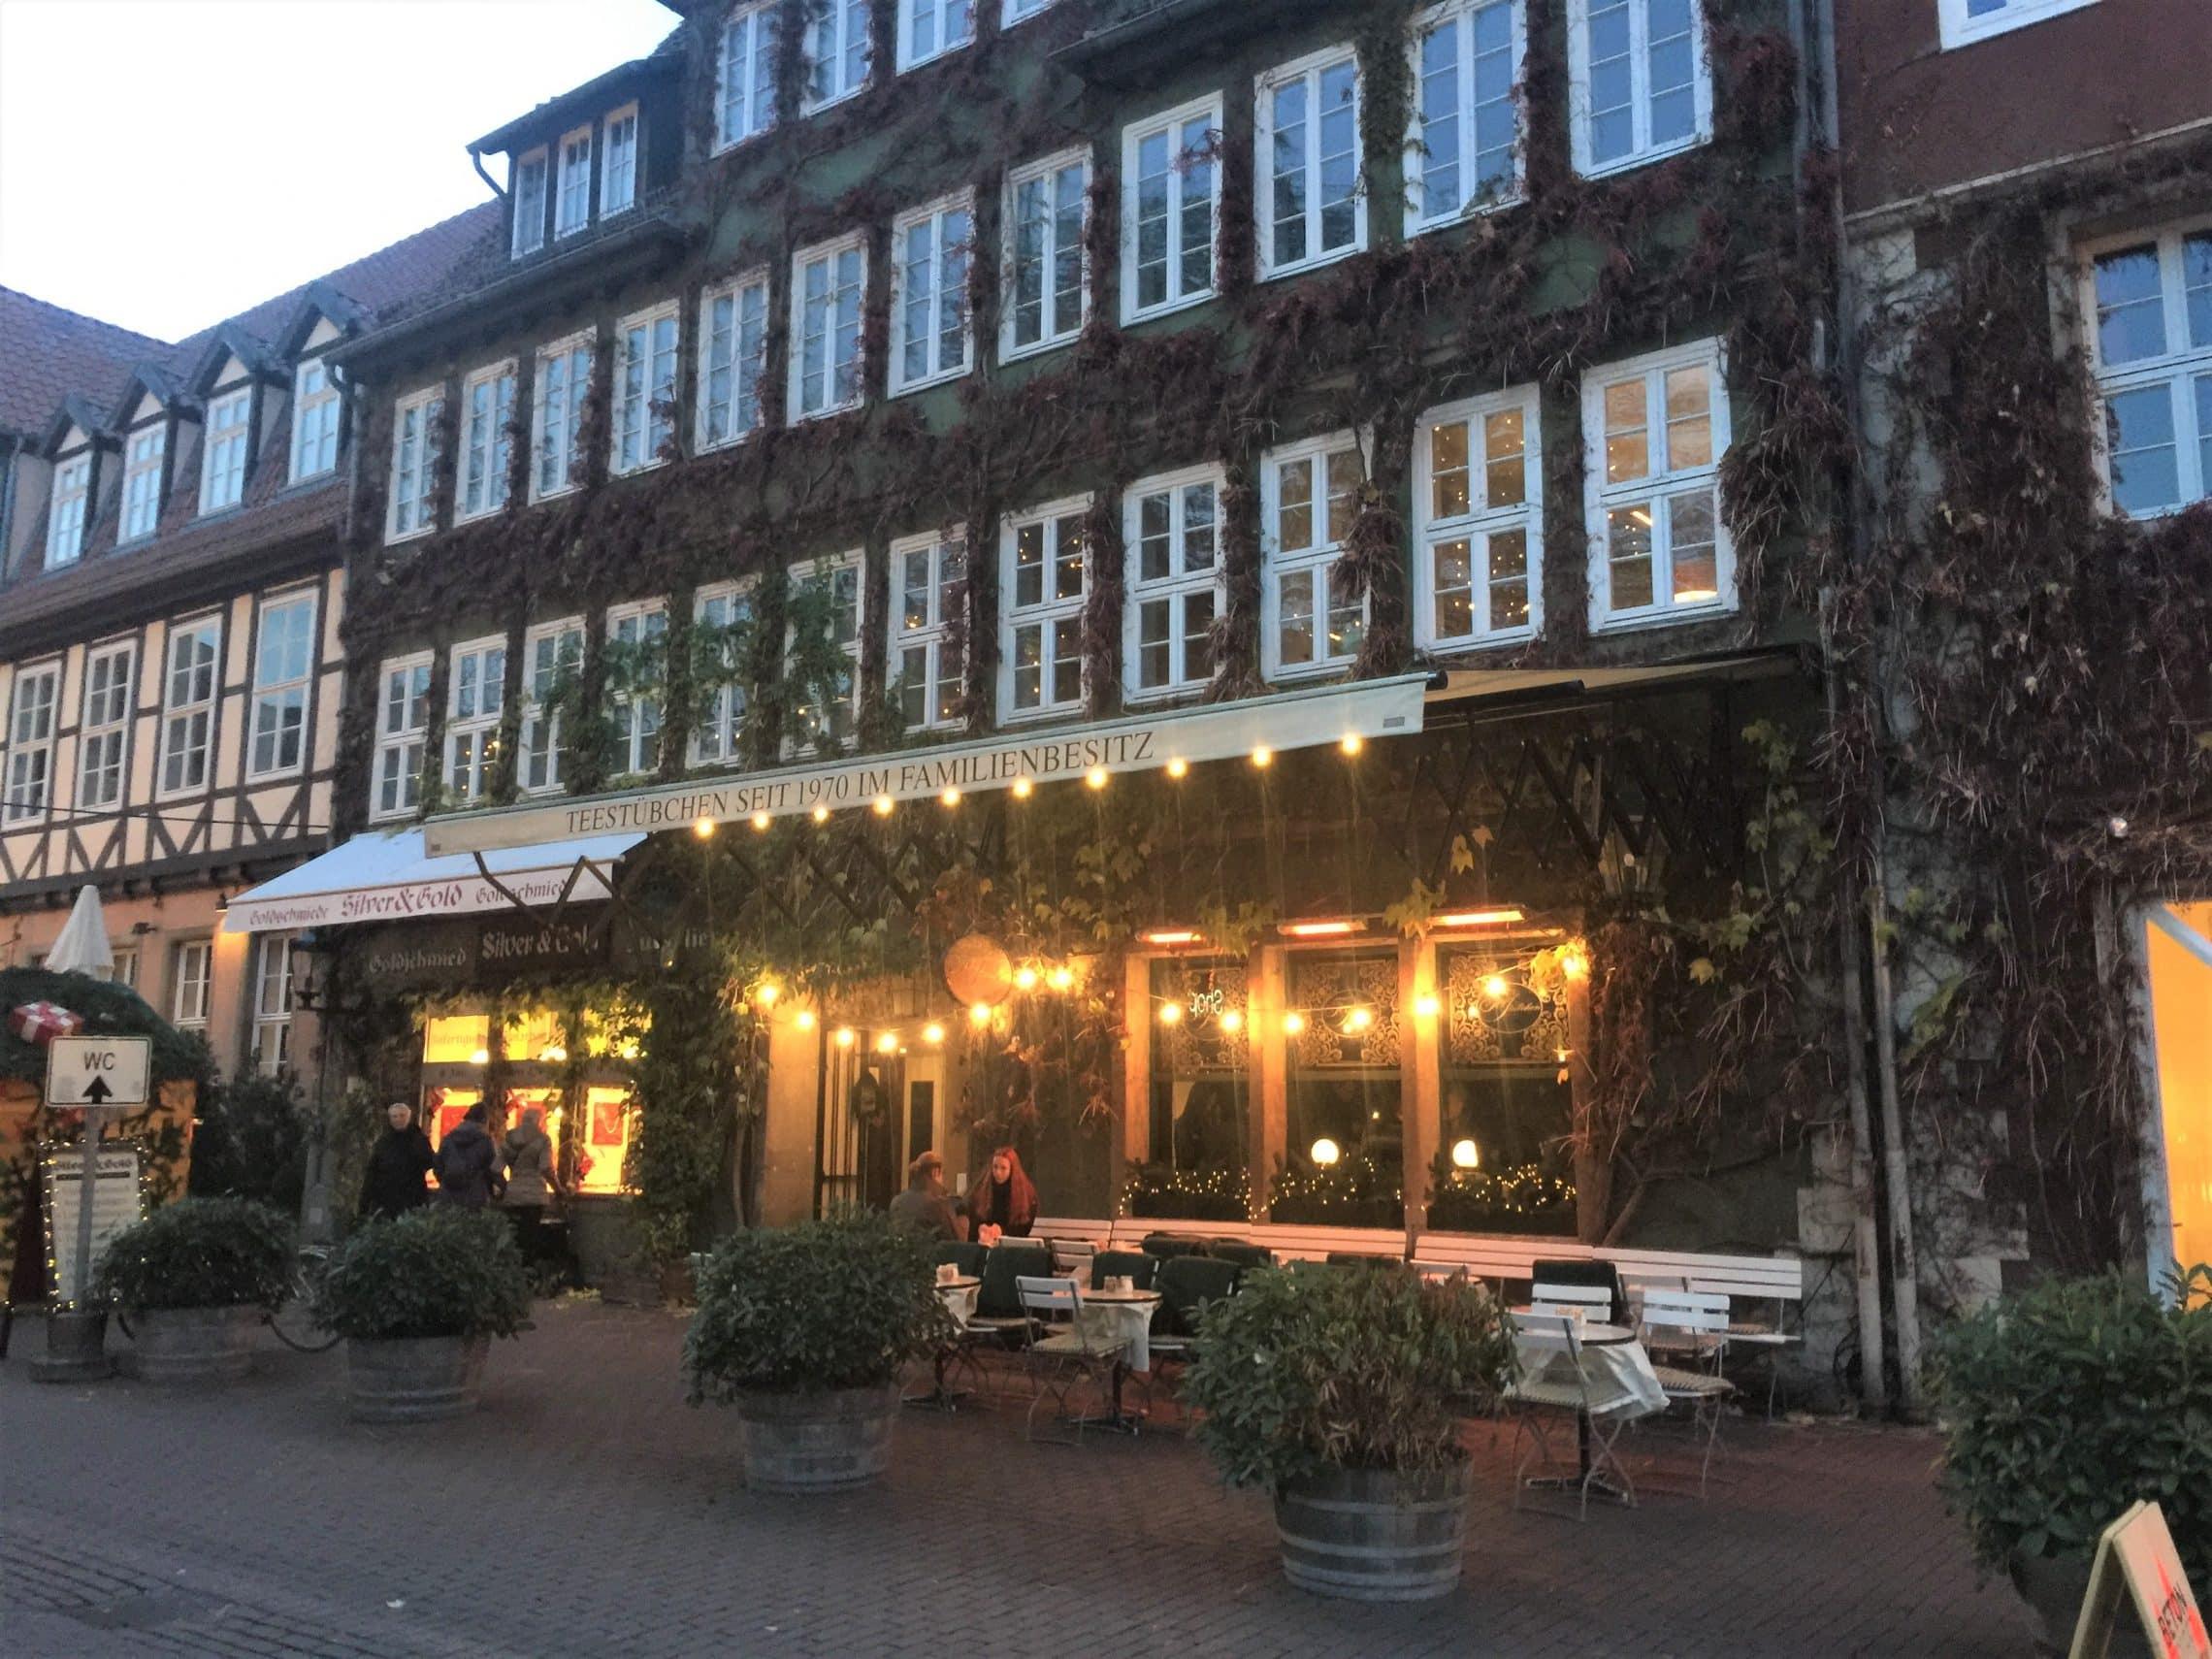 Style Hannover Teestübchen B - Teestübchen – Tradition seit 1970